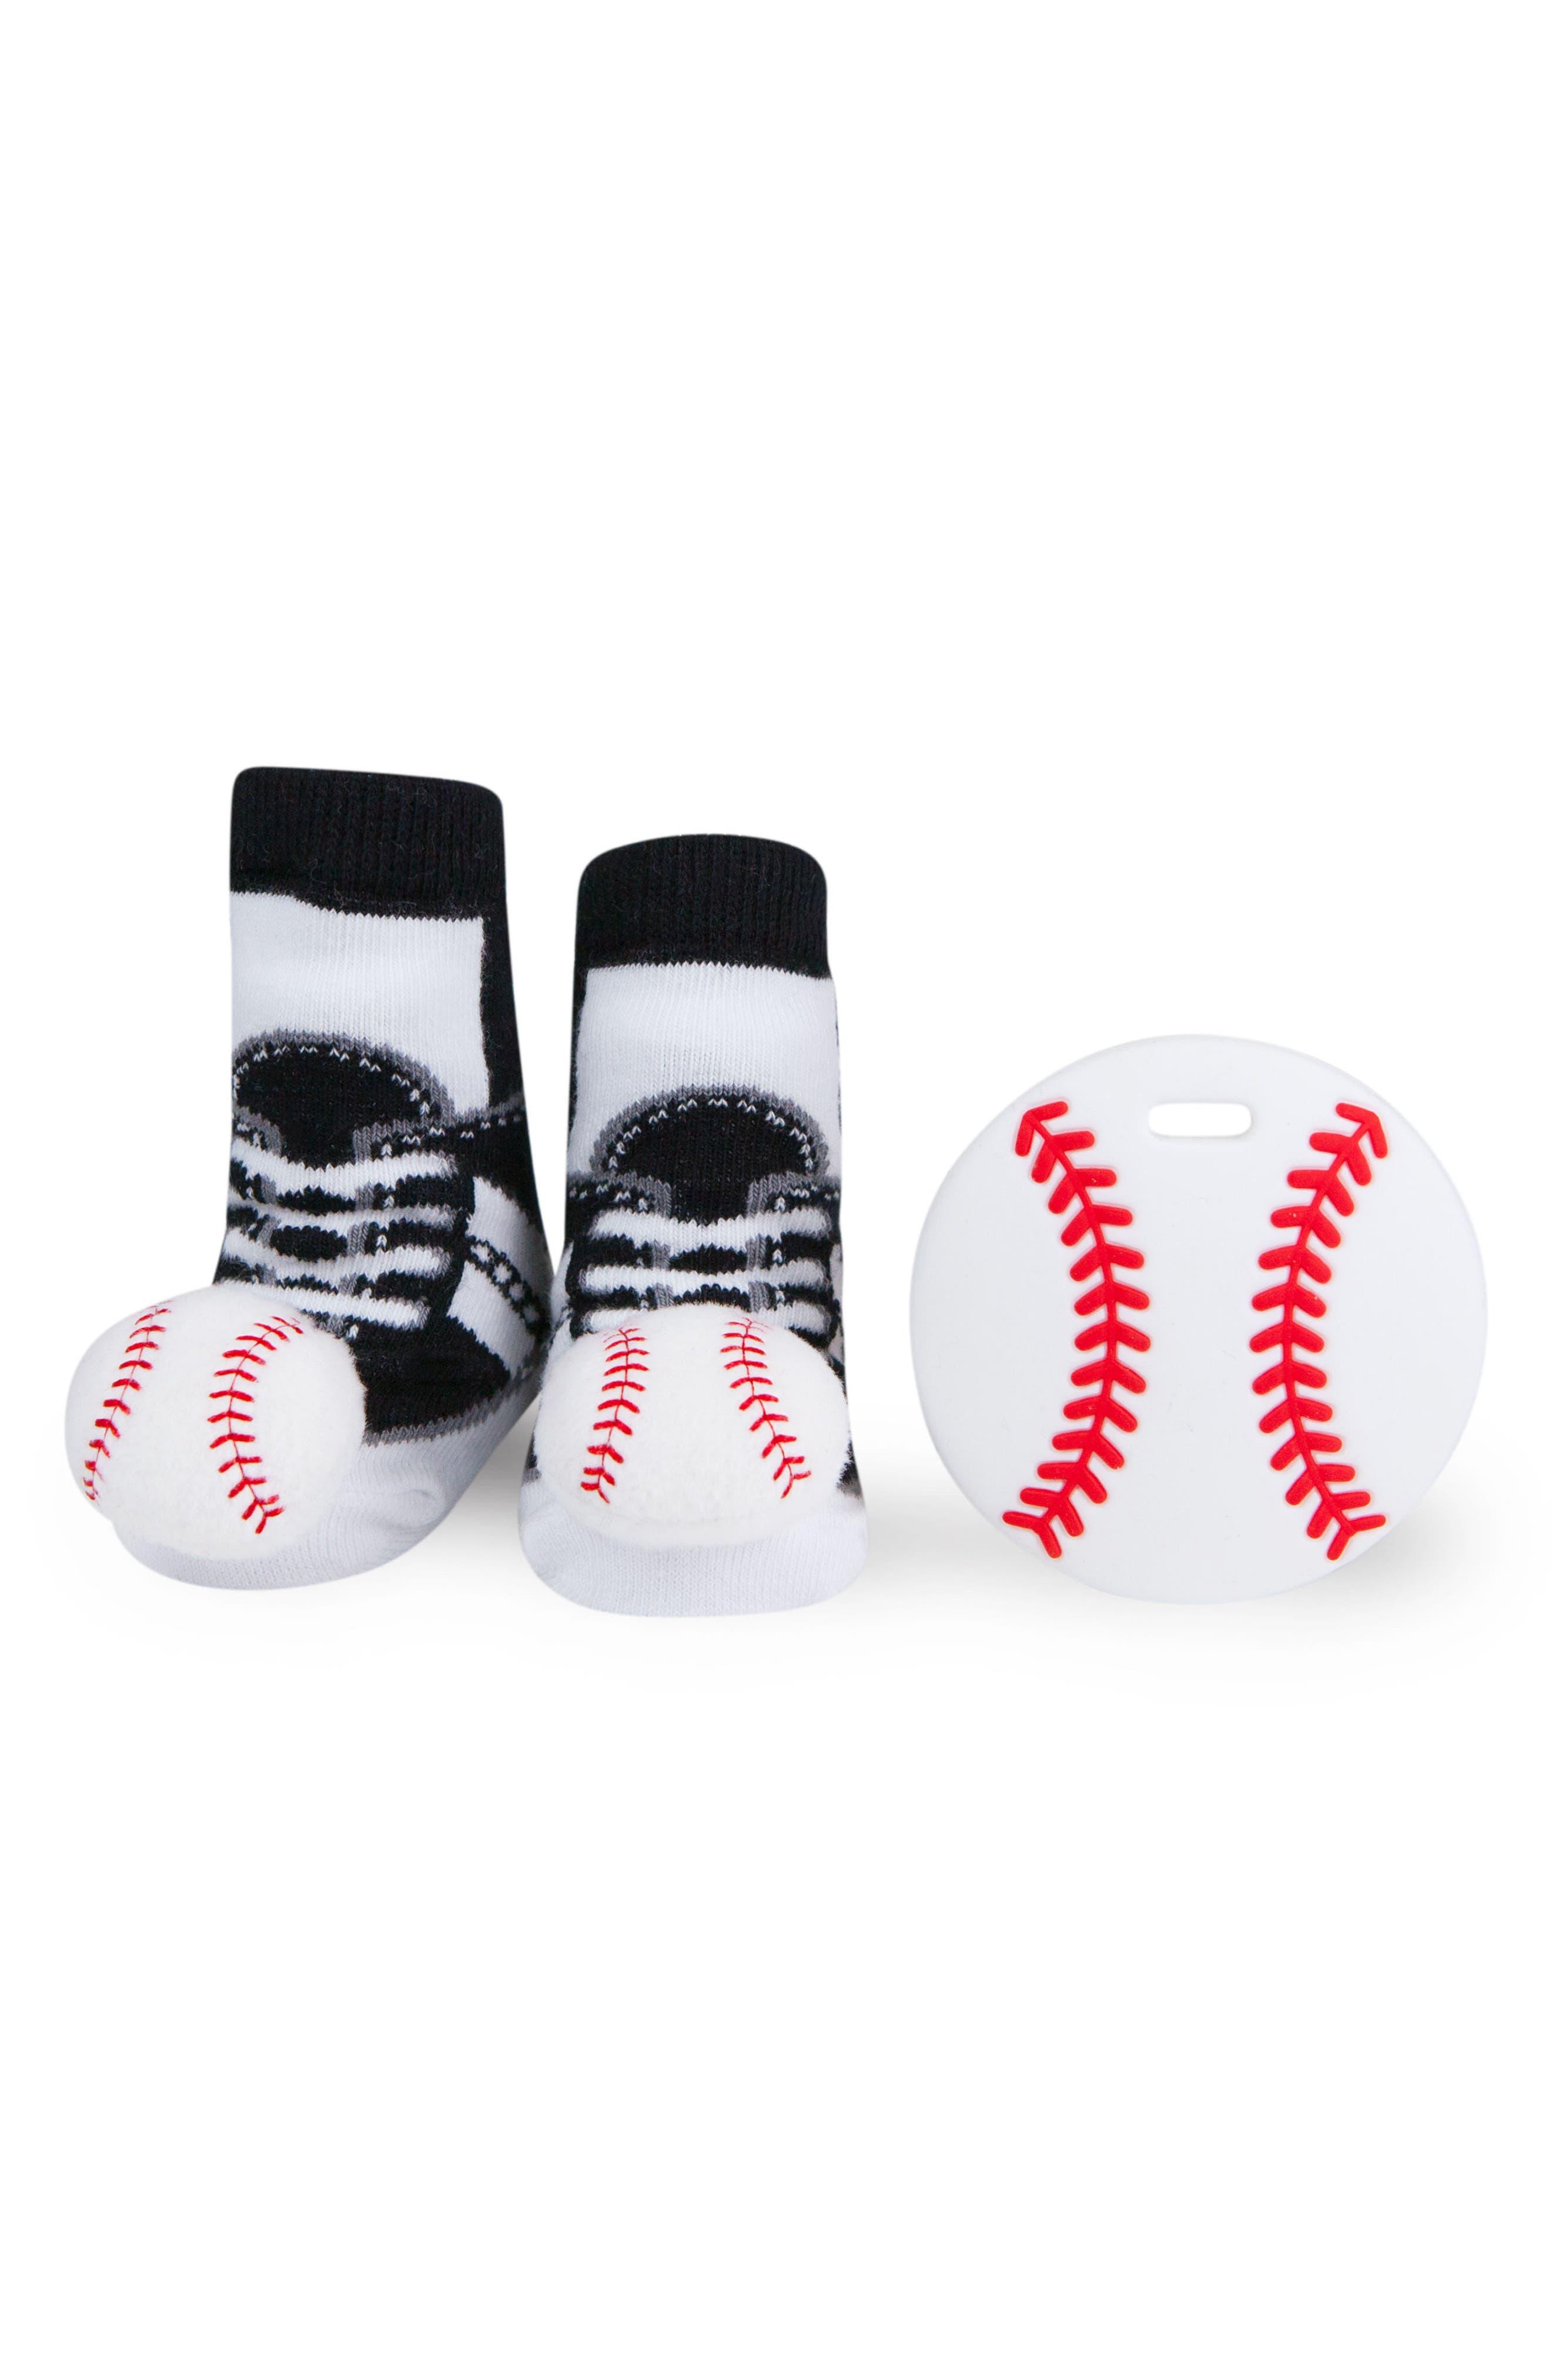 Baseball Rattle Socks & Teether Gift Set,                             Main thumbnail 1, color,                             WHITE